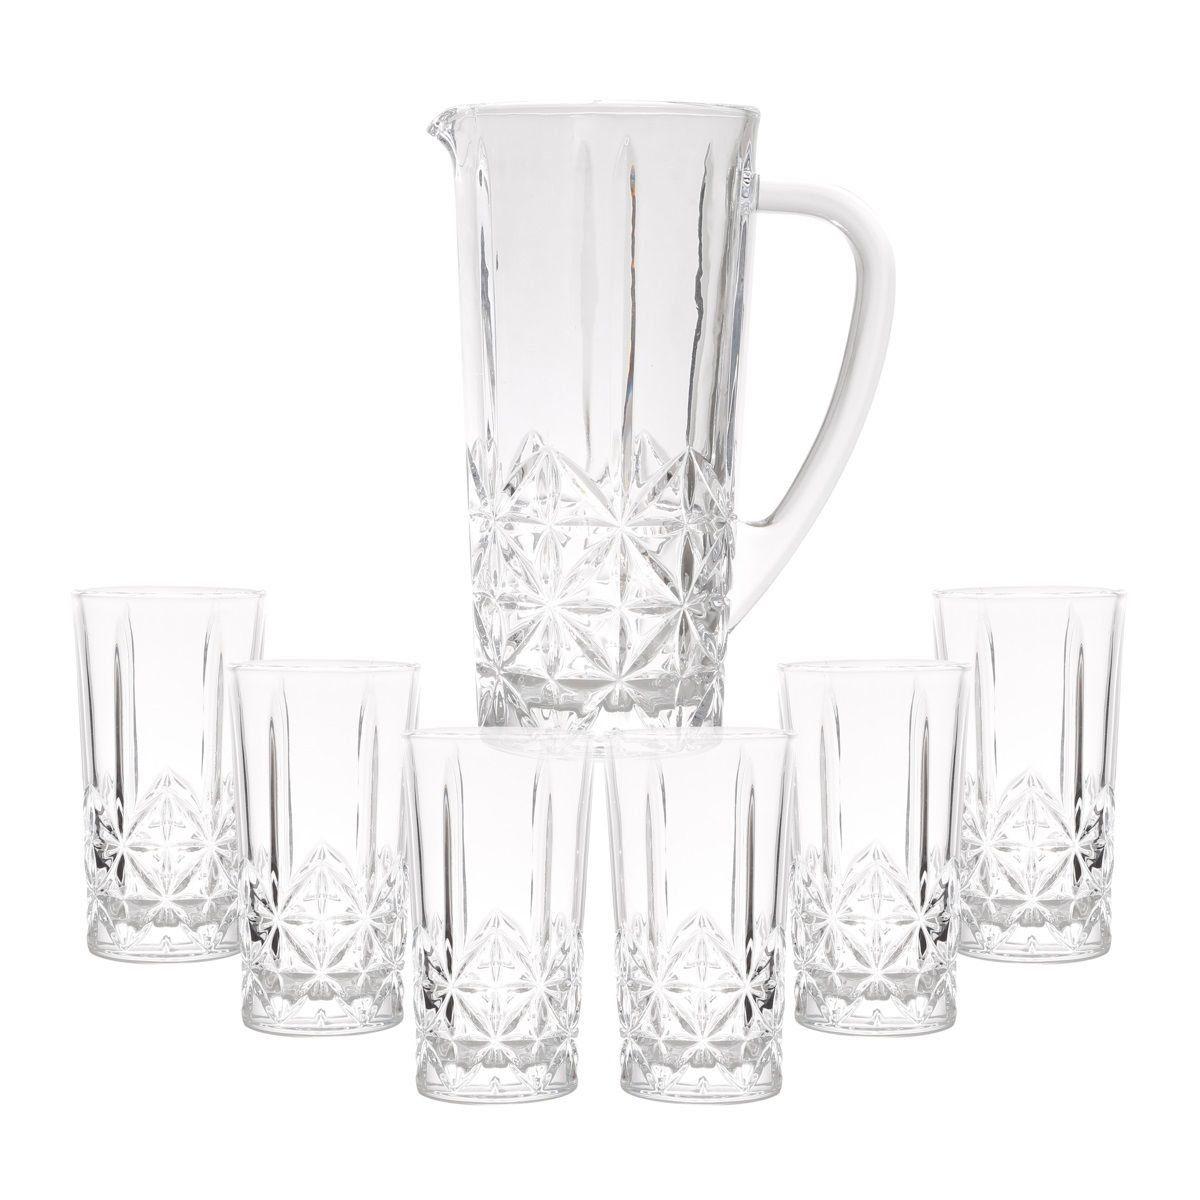 Conjunto Jarra 1 litro + 6 copos 290ml de vidro Stella Transparente Bon Gourmet - 25824